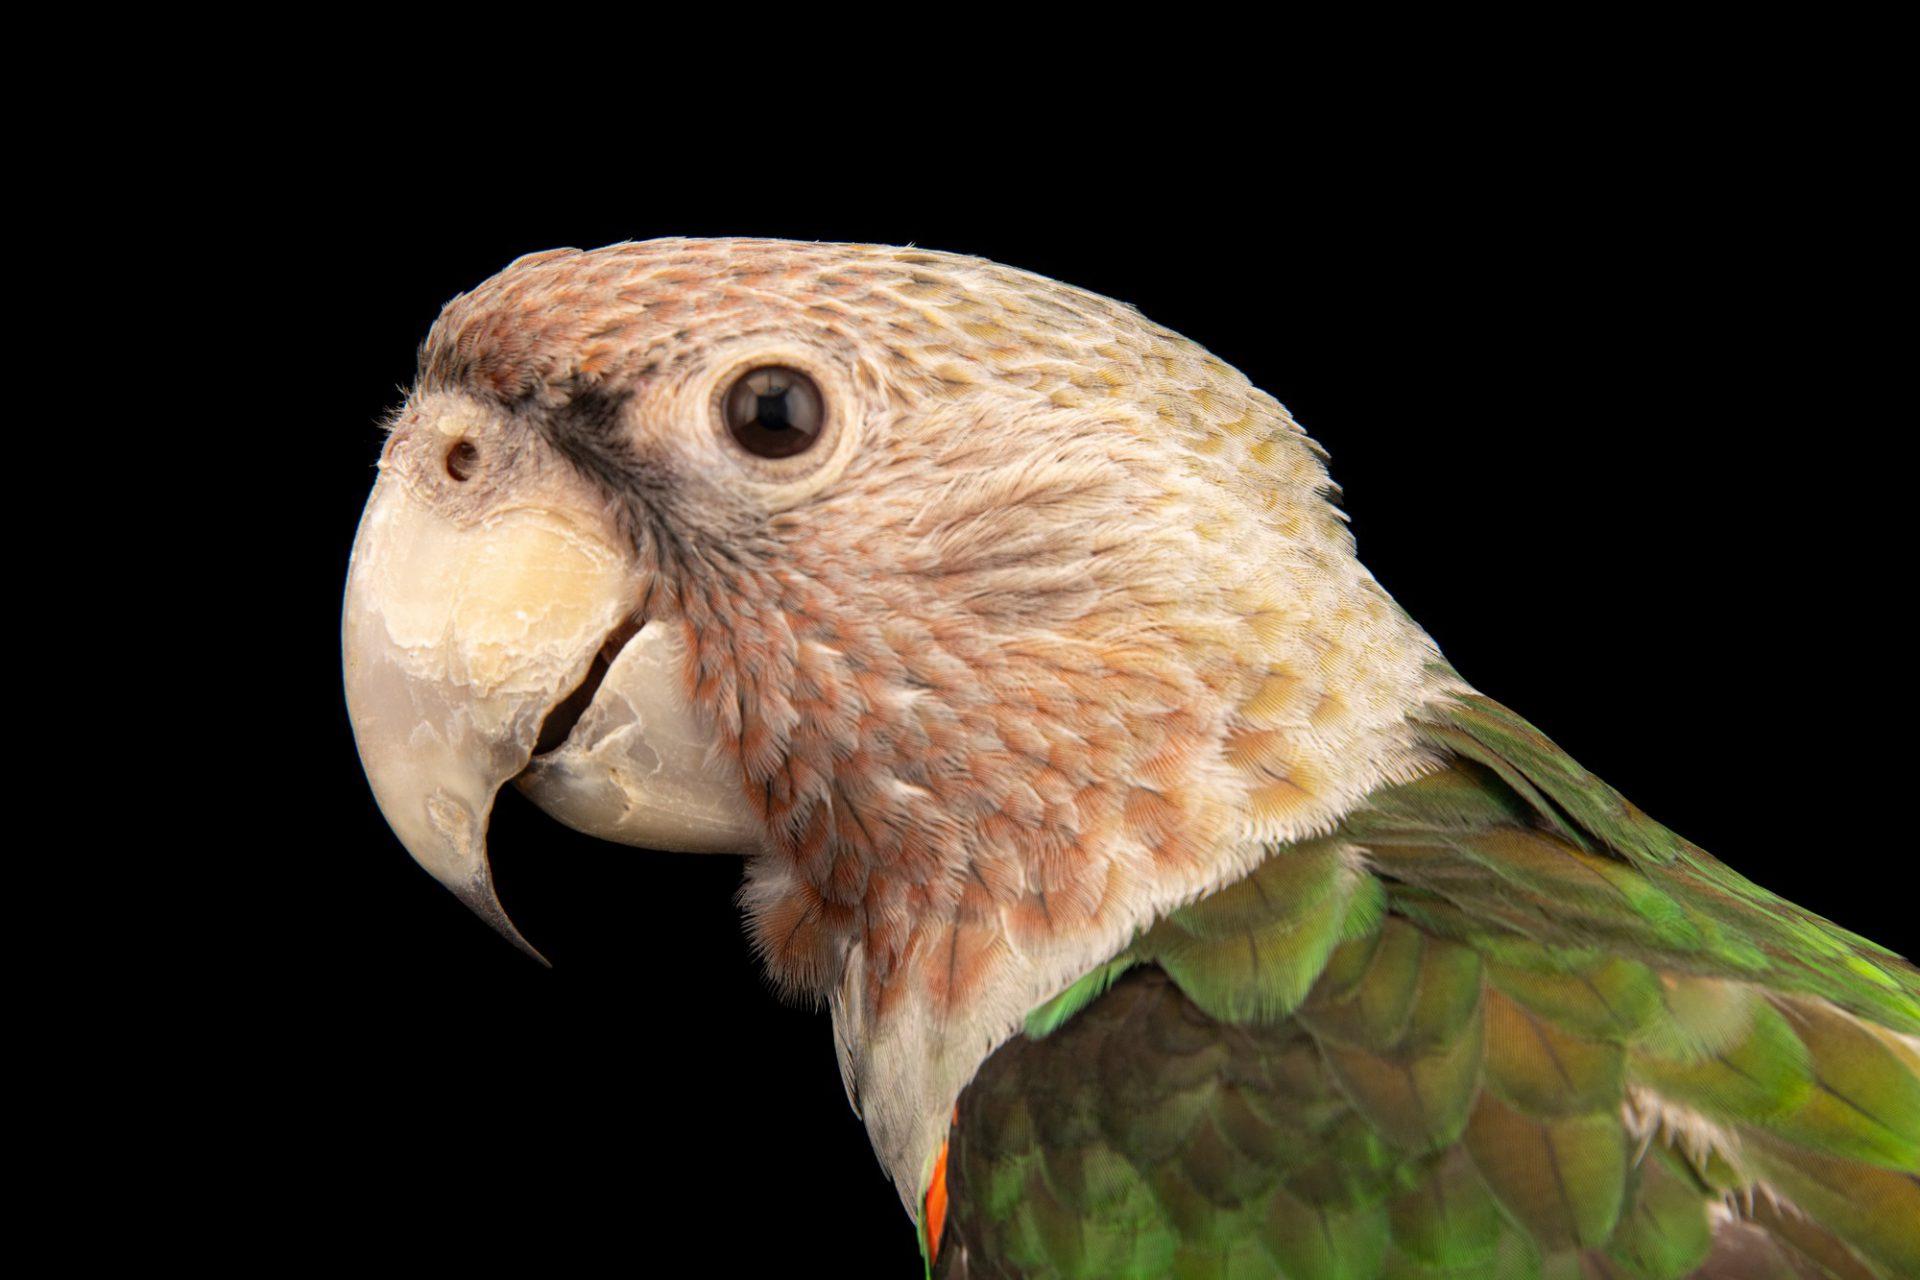 Photo: Brown-necked parrot (Poicephalus fuscicollis suhaelicus) at the Avilon Zoo.